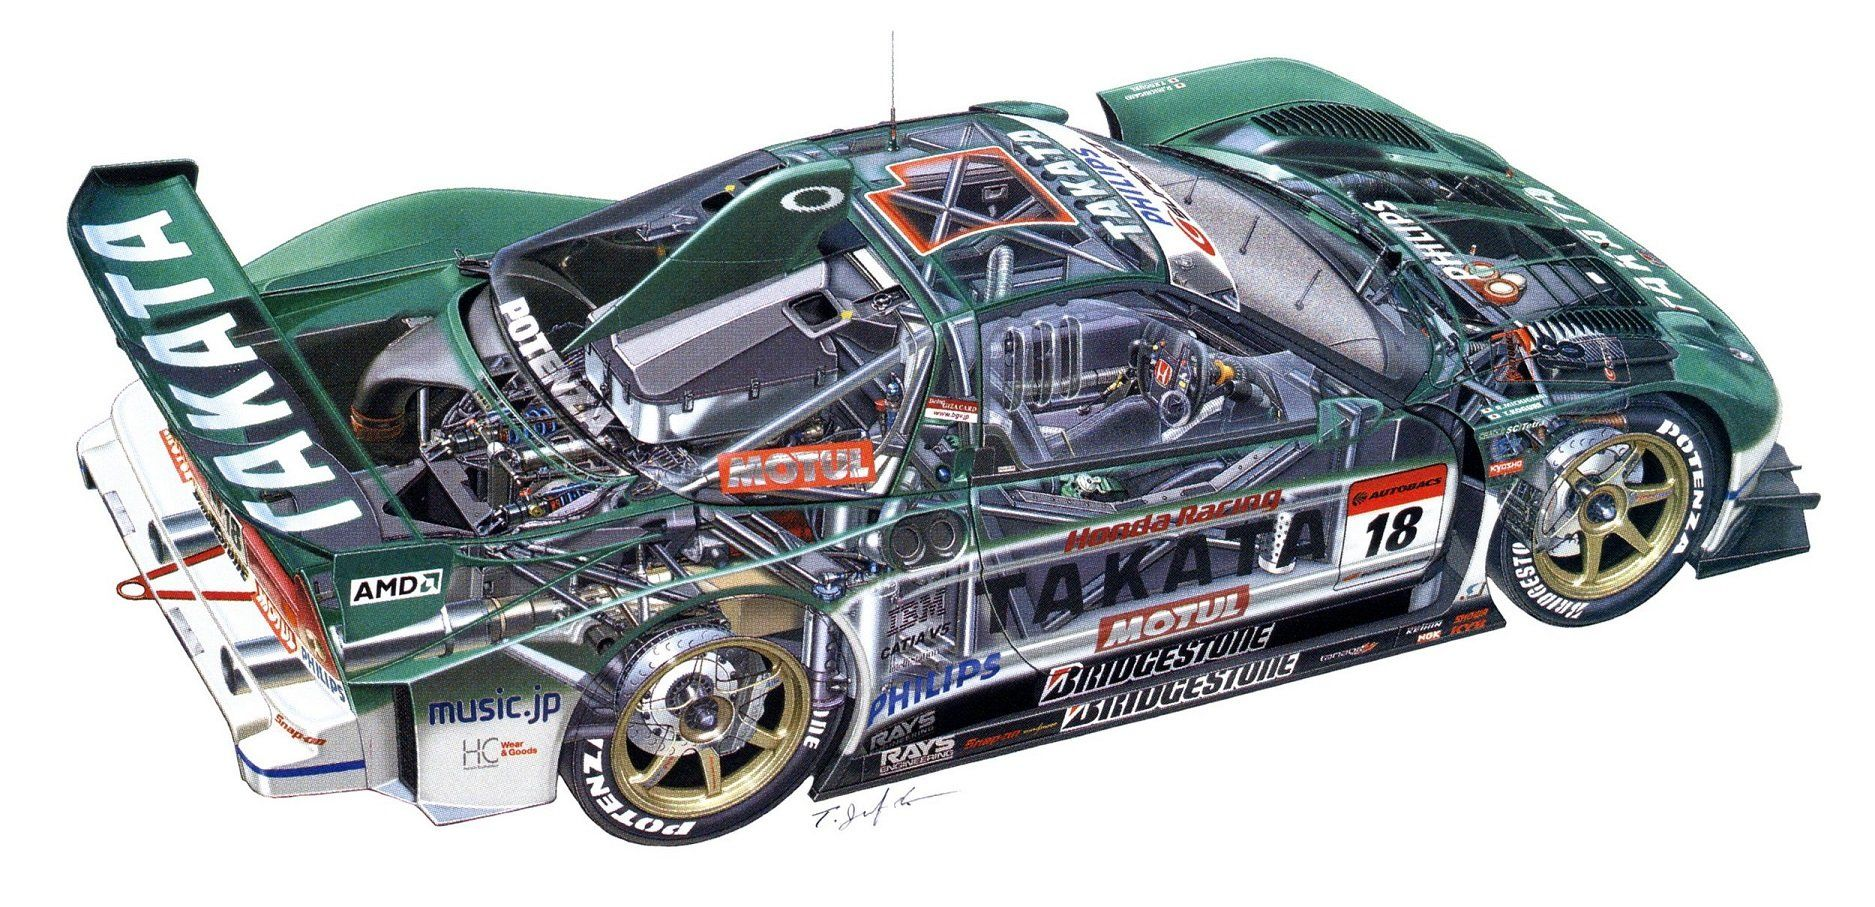 Honda Nsx Takata Dome Nsx Jgtc Super Gt Cars Racecars Technical Cutaway Wallpaper Nsx Gt Cars Honda